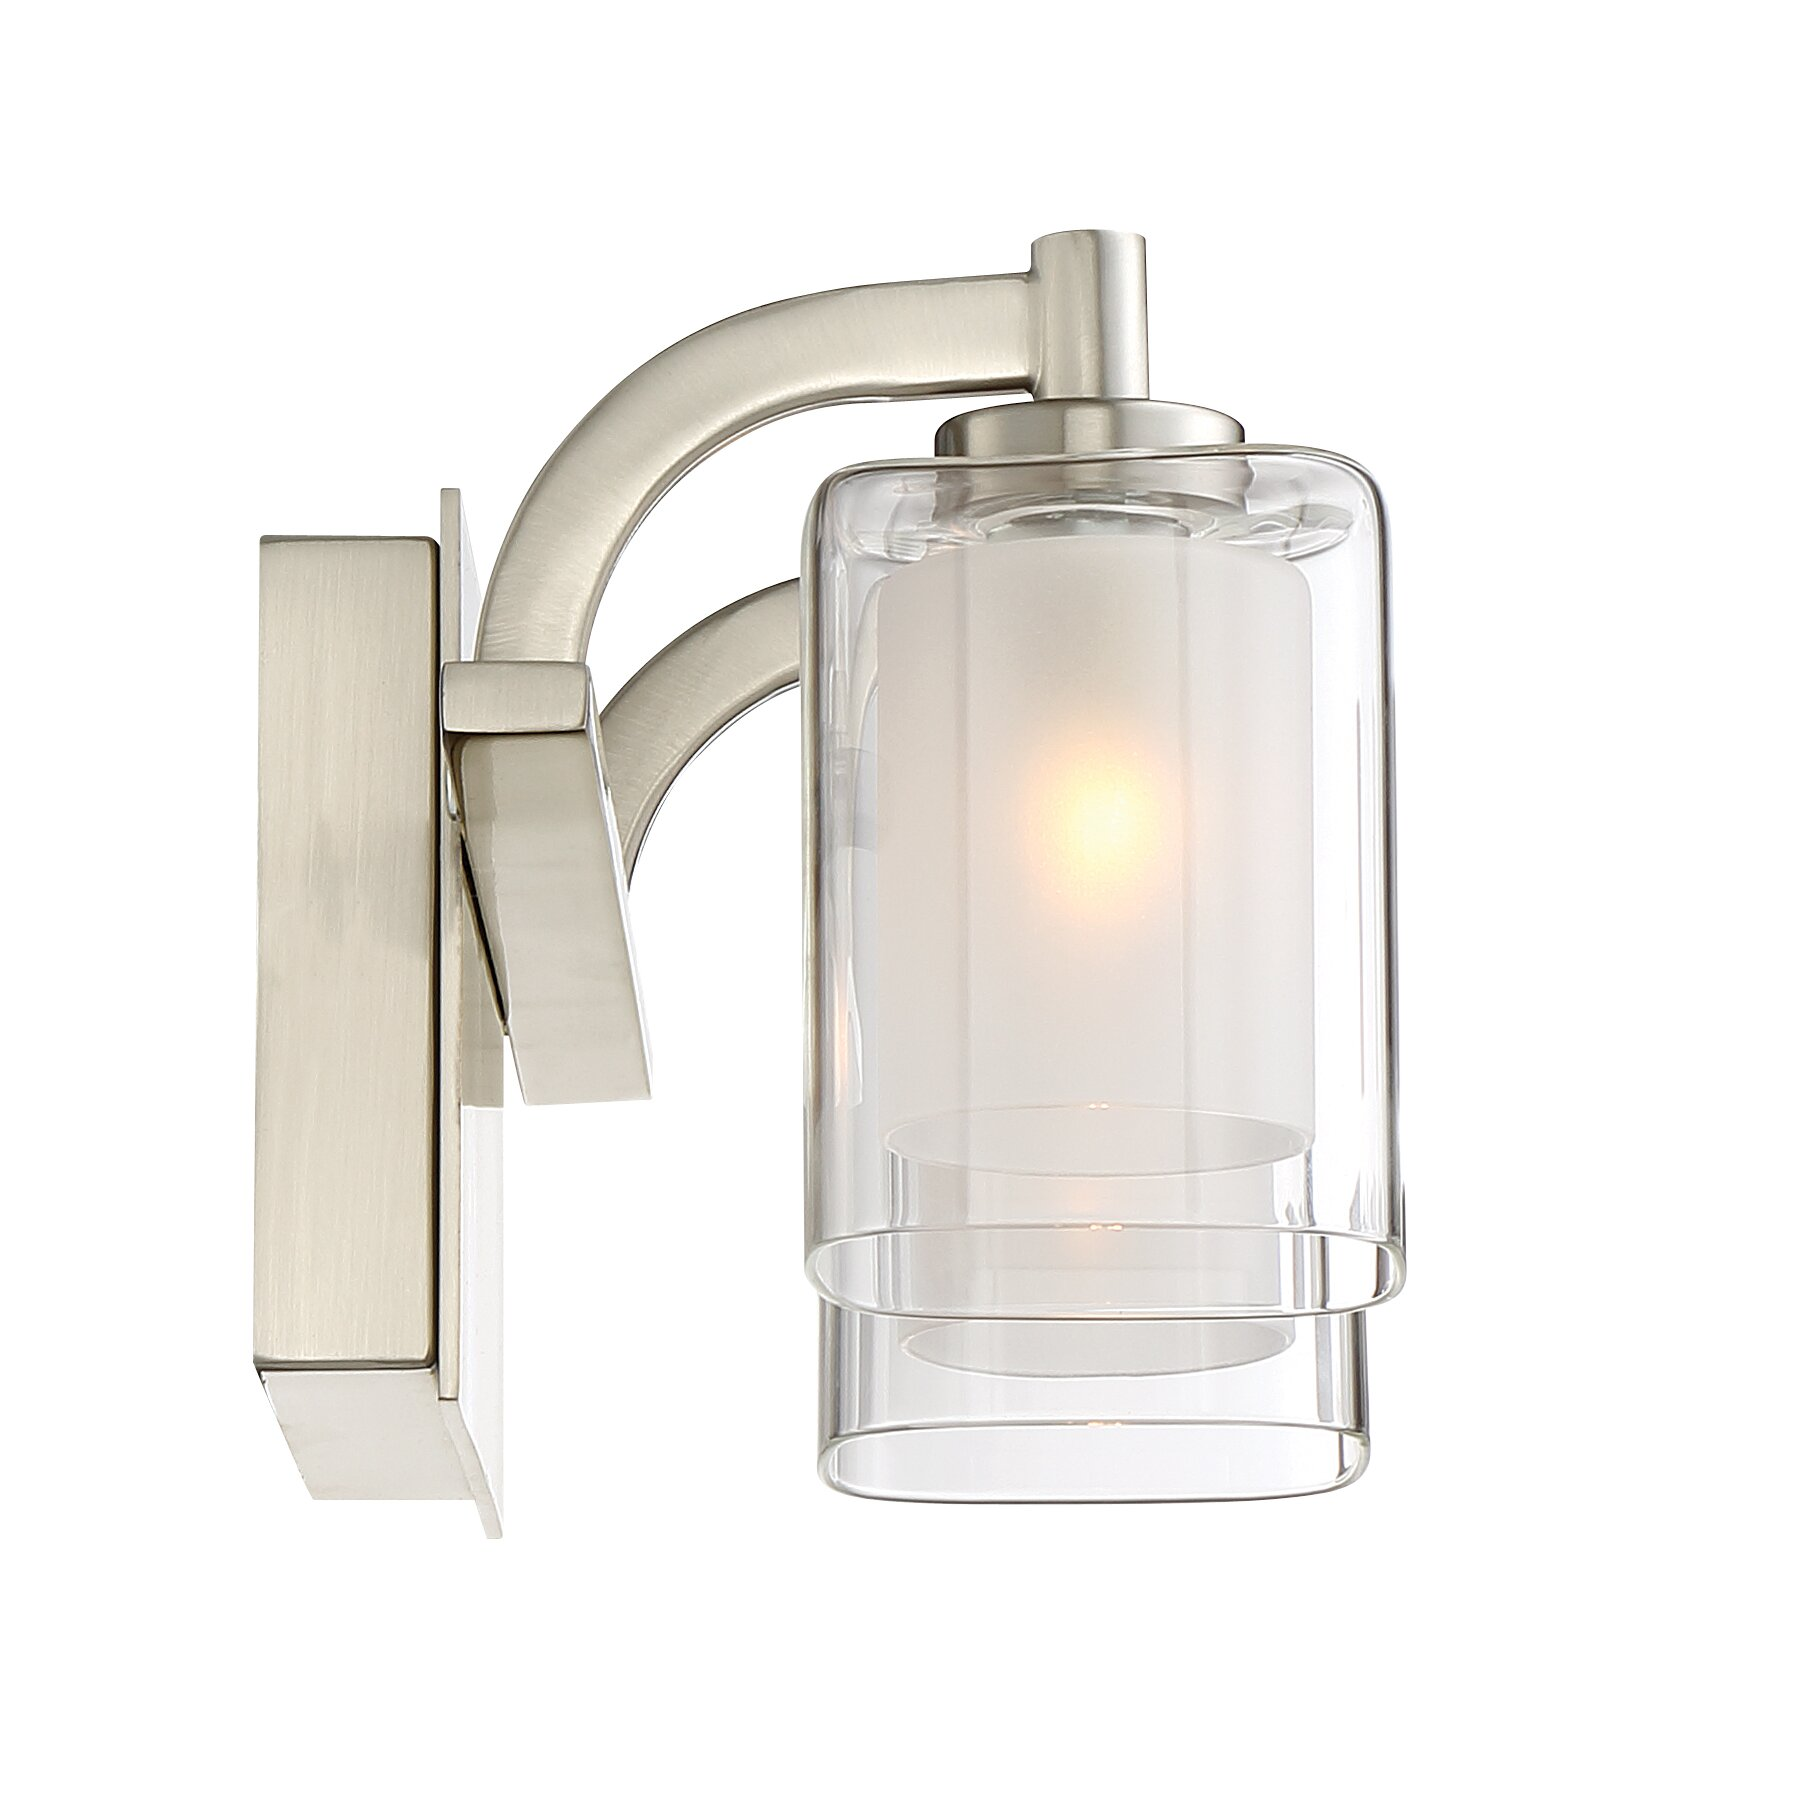 Quoizel kolt 2 light bath bar reviews wayfair for Quoizel bathroom lighting